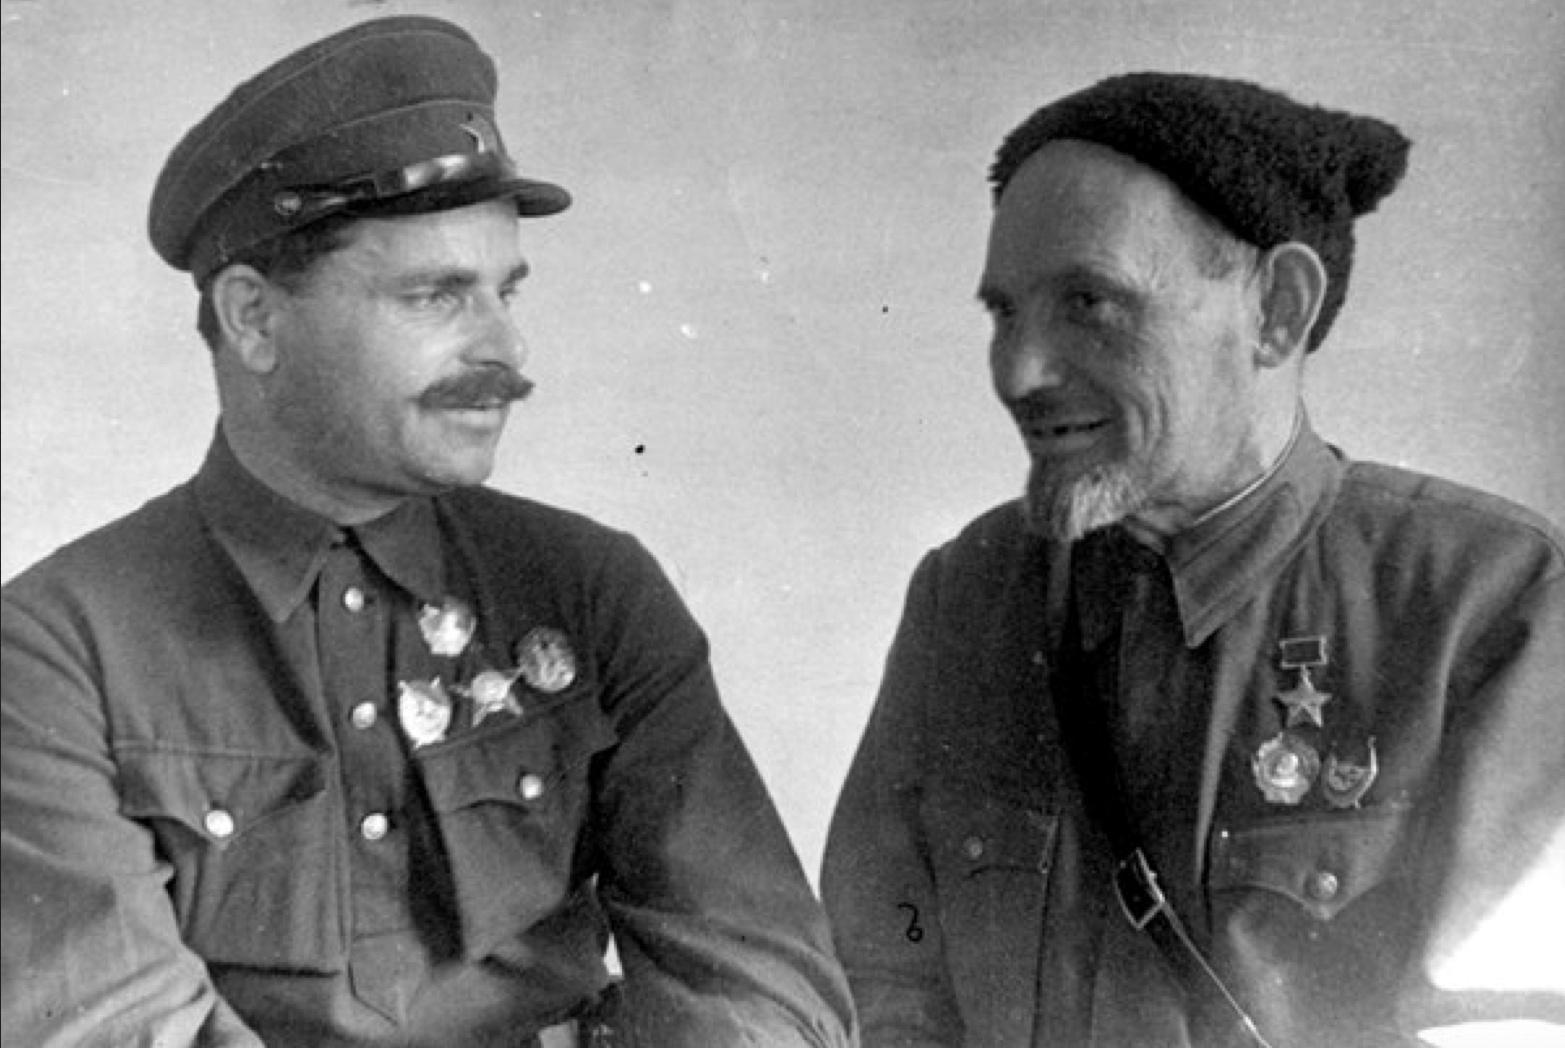 Сидор Повпак и Руднев Семен Васильевич